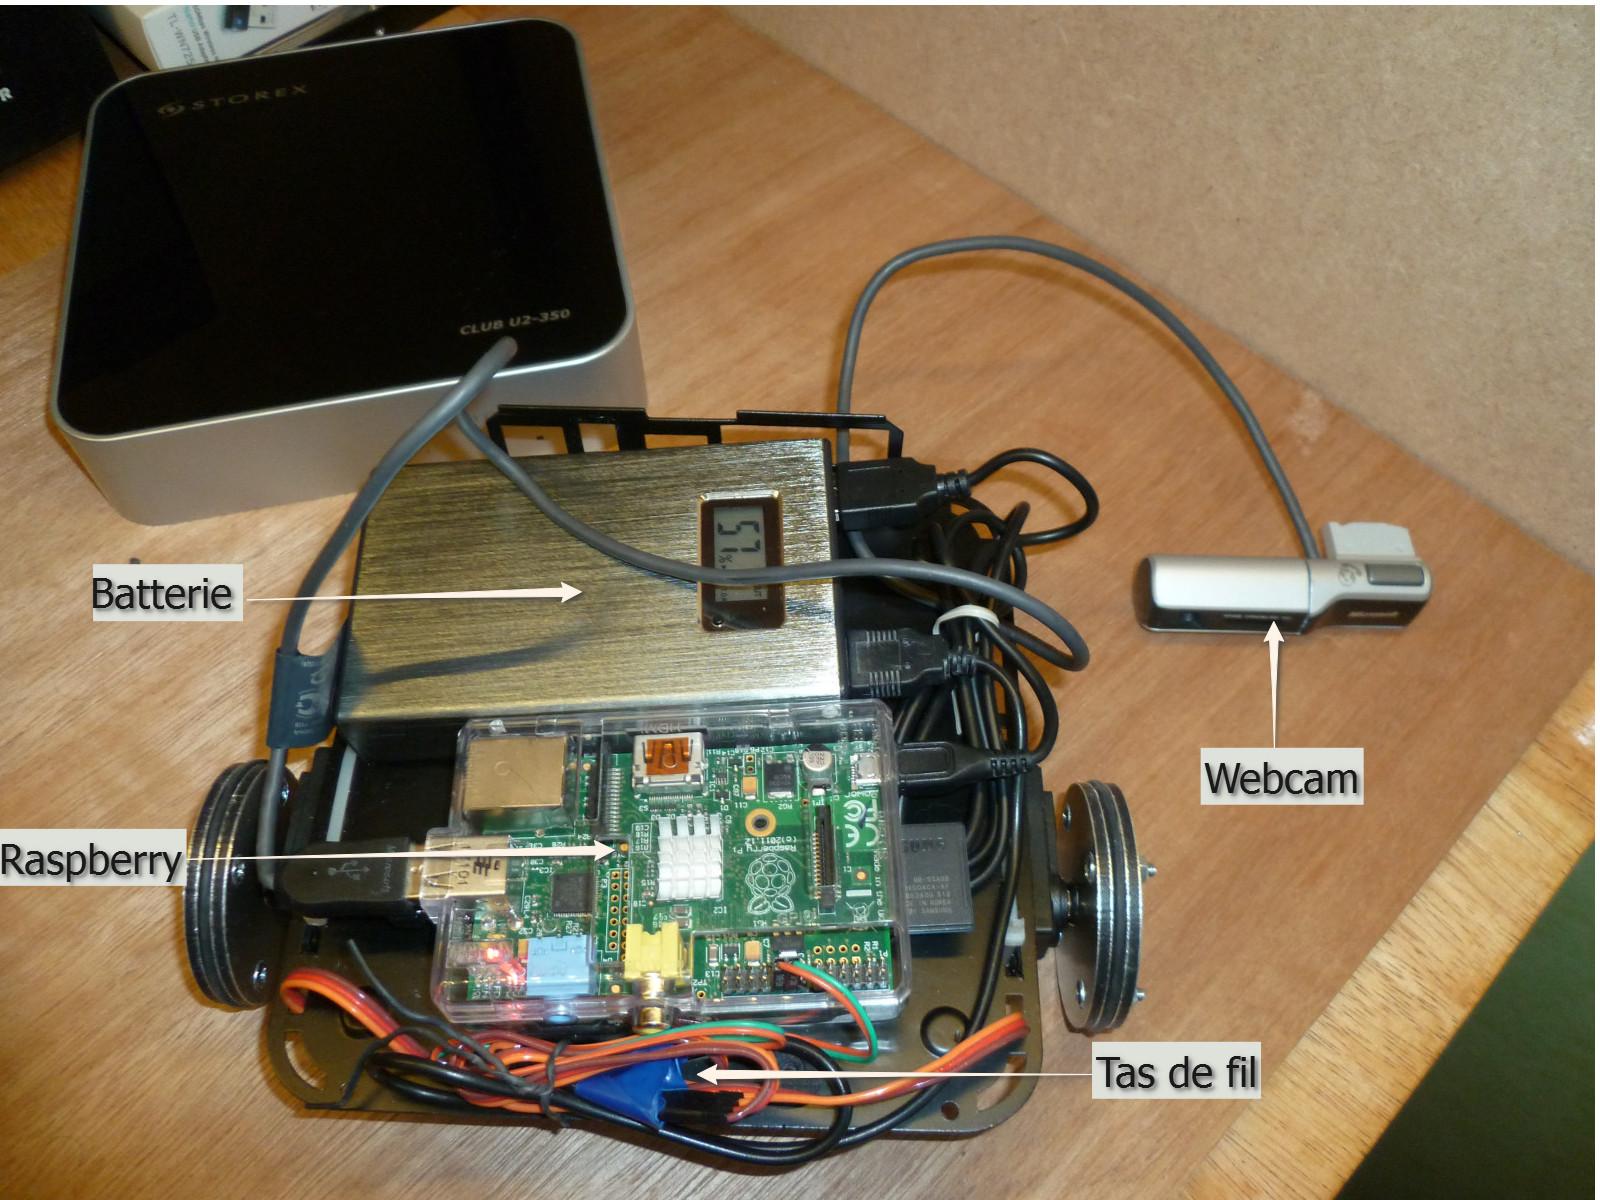 l'anatomie du WifiBotBerry